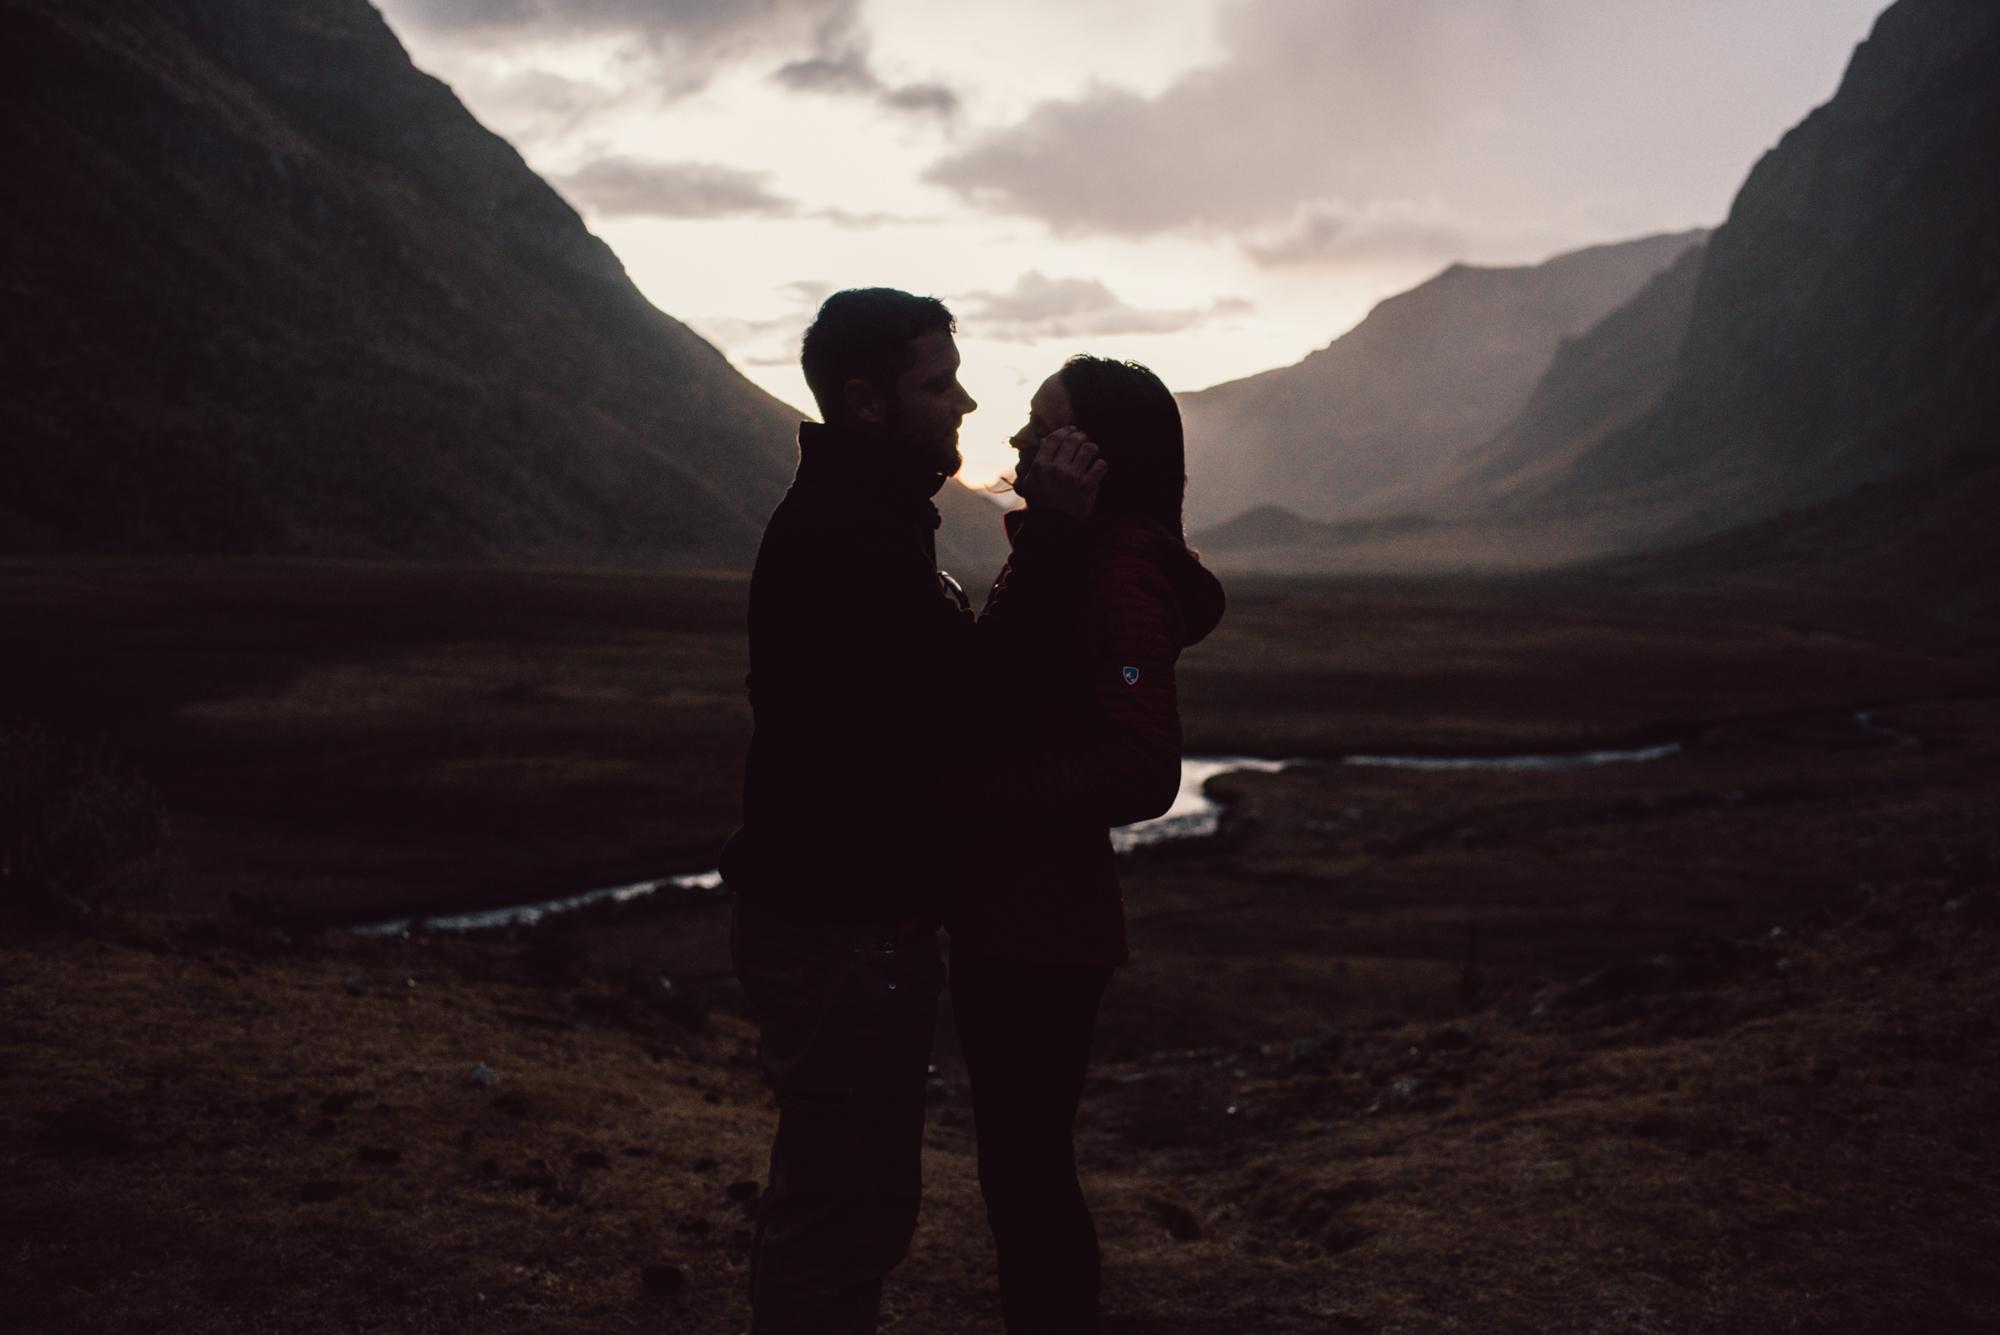 Damian+and+Jesse+Engagement+Session+Huayhuash+Mountain+Trekking+Peru_151.jpg